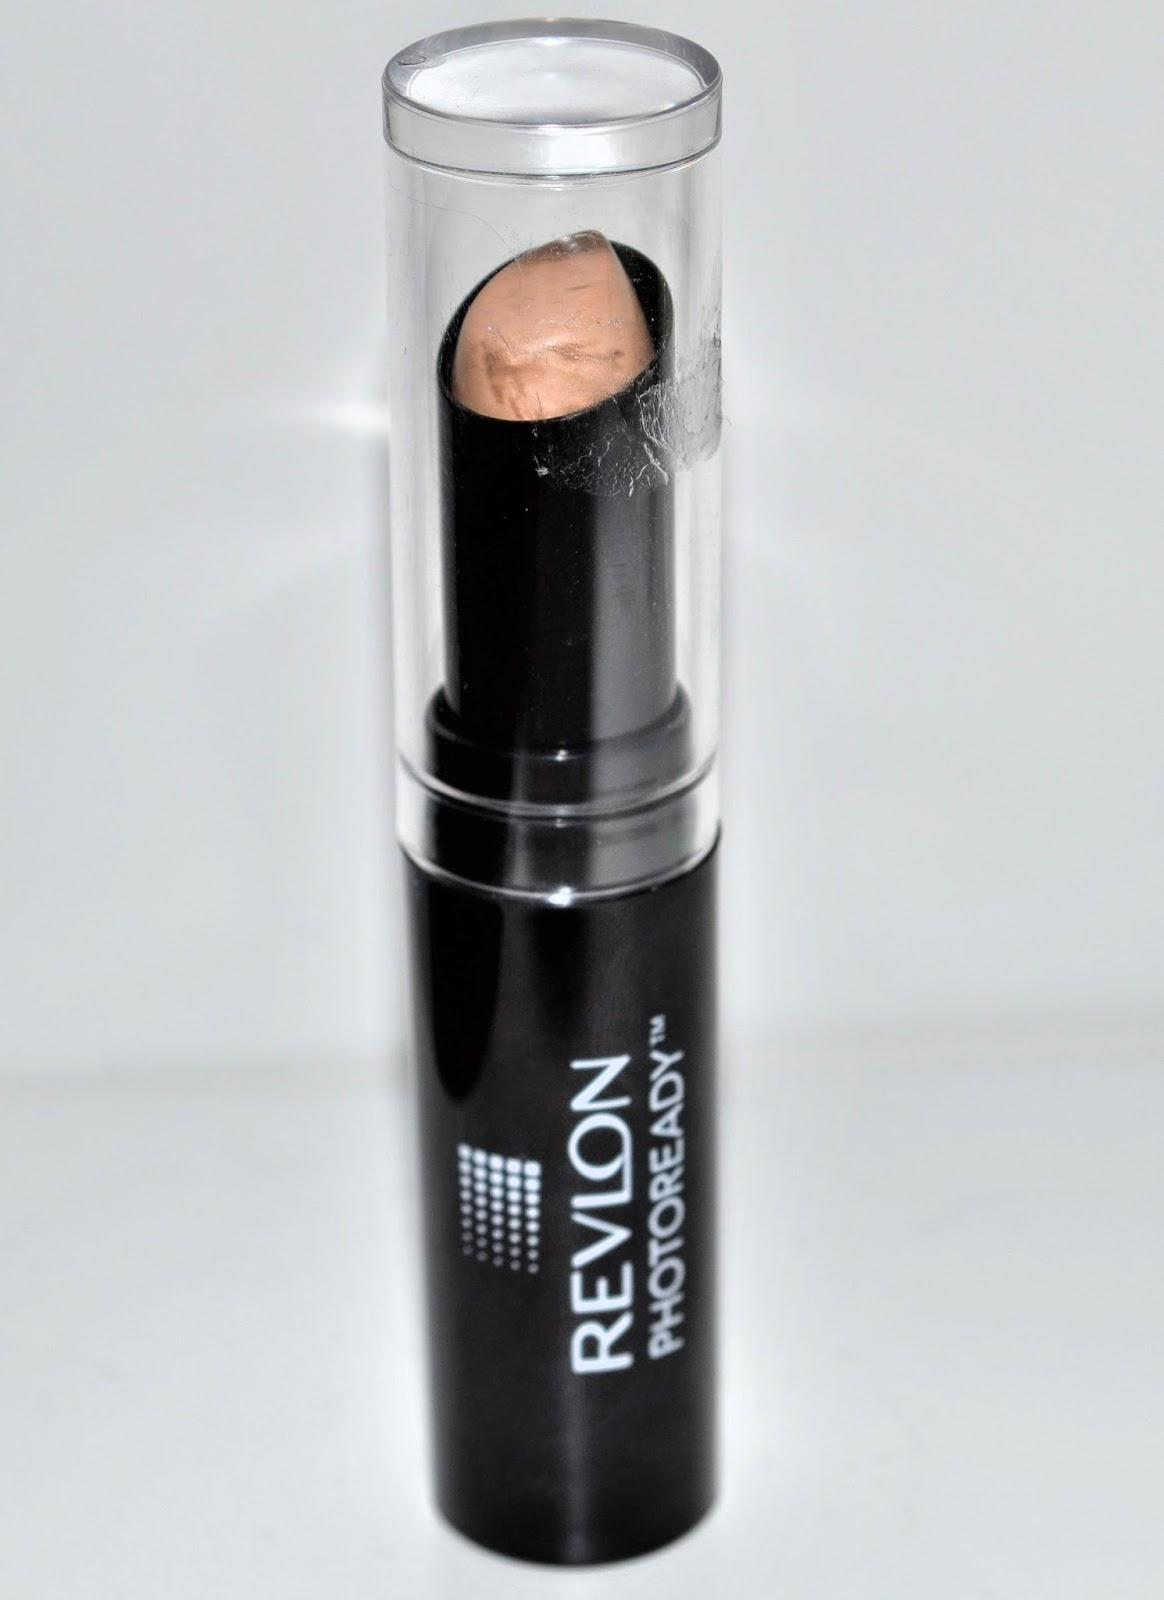 Simply Diana's Makeup Chronicles: Revlon PhotoReady Concealer ...